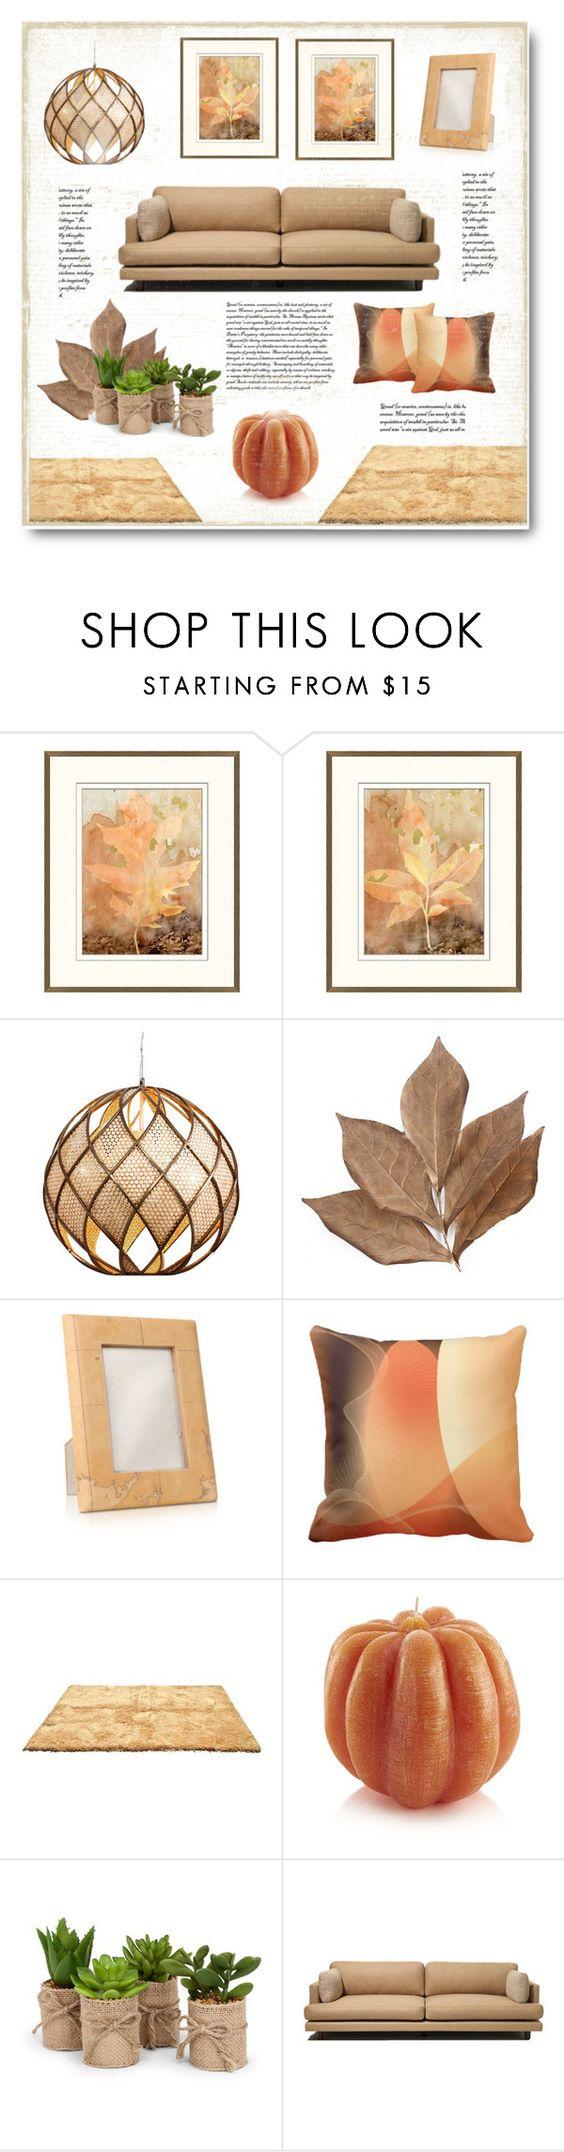 """autumn"" by jana-masarovicova ❤ liked on Polyvore featuring interior, interiors, interior design, home, home decor, interior decorating, Pottery Barn, Varaluz, Bliss Studio and Alviero Martini 1° Classe"